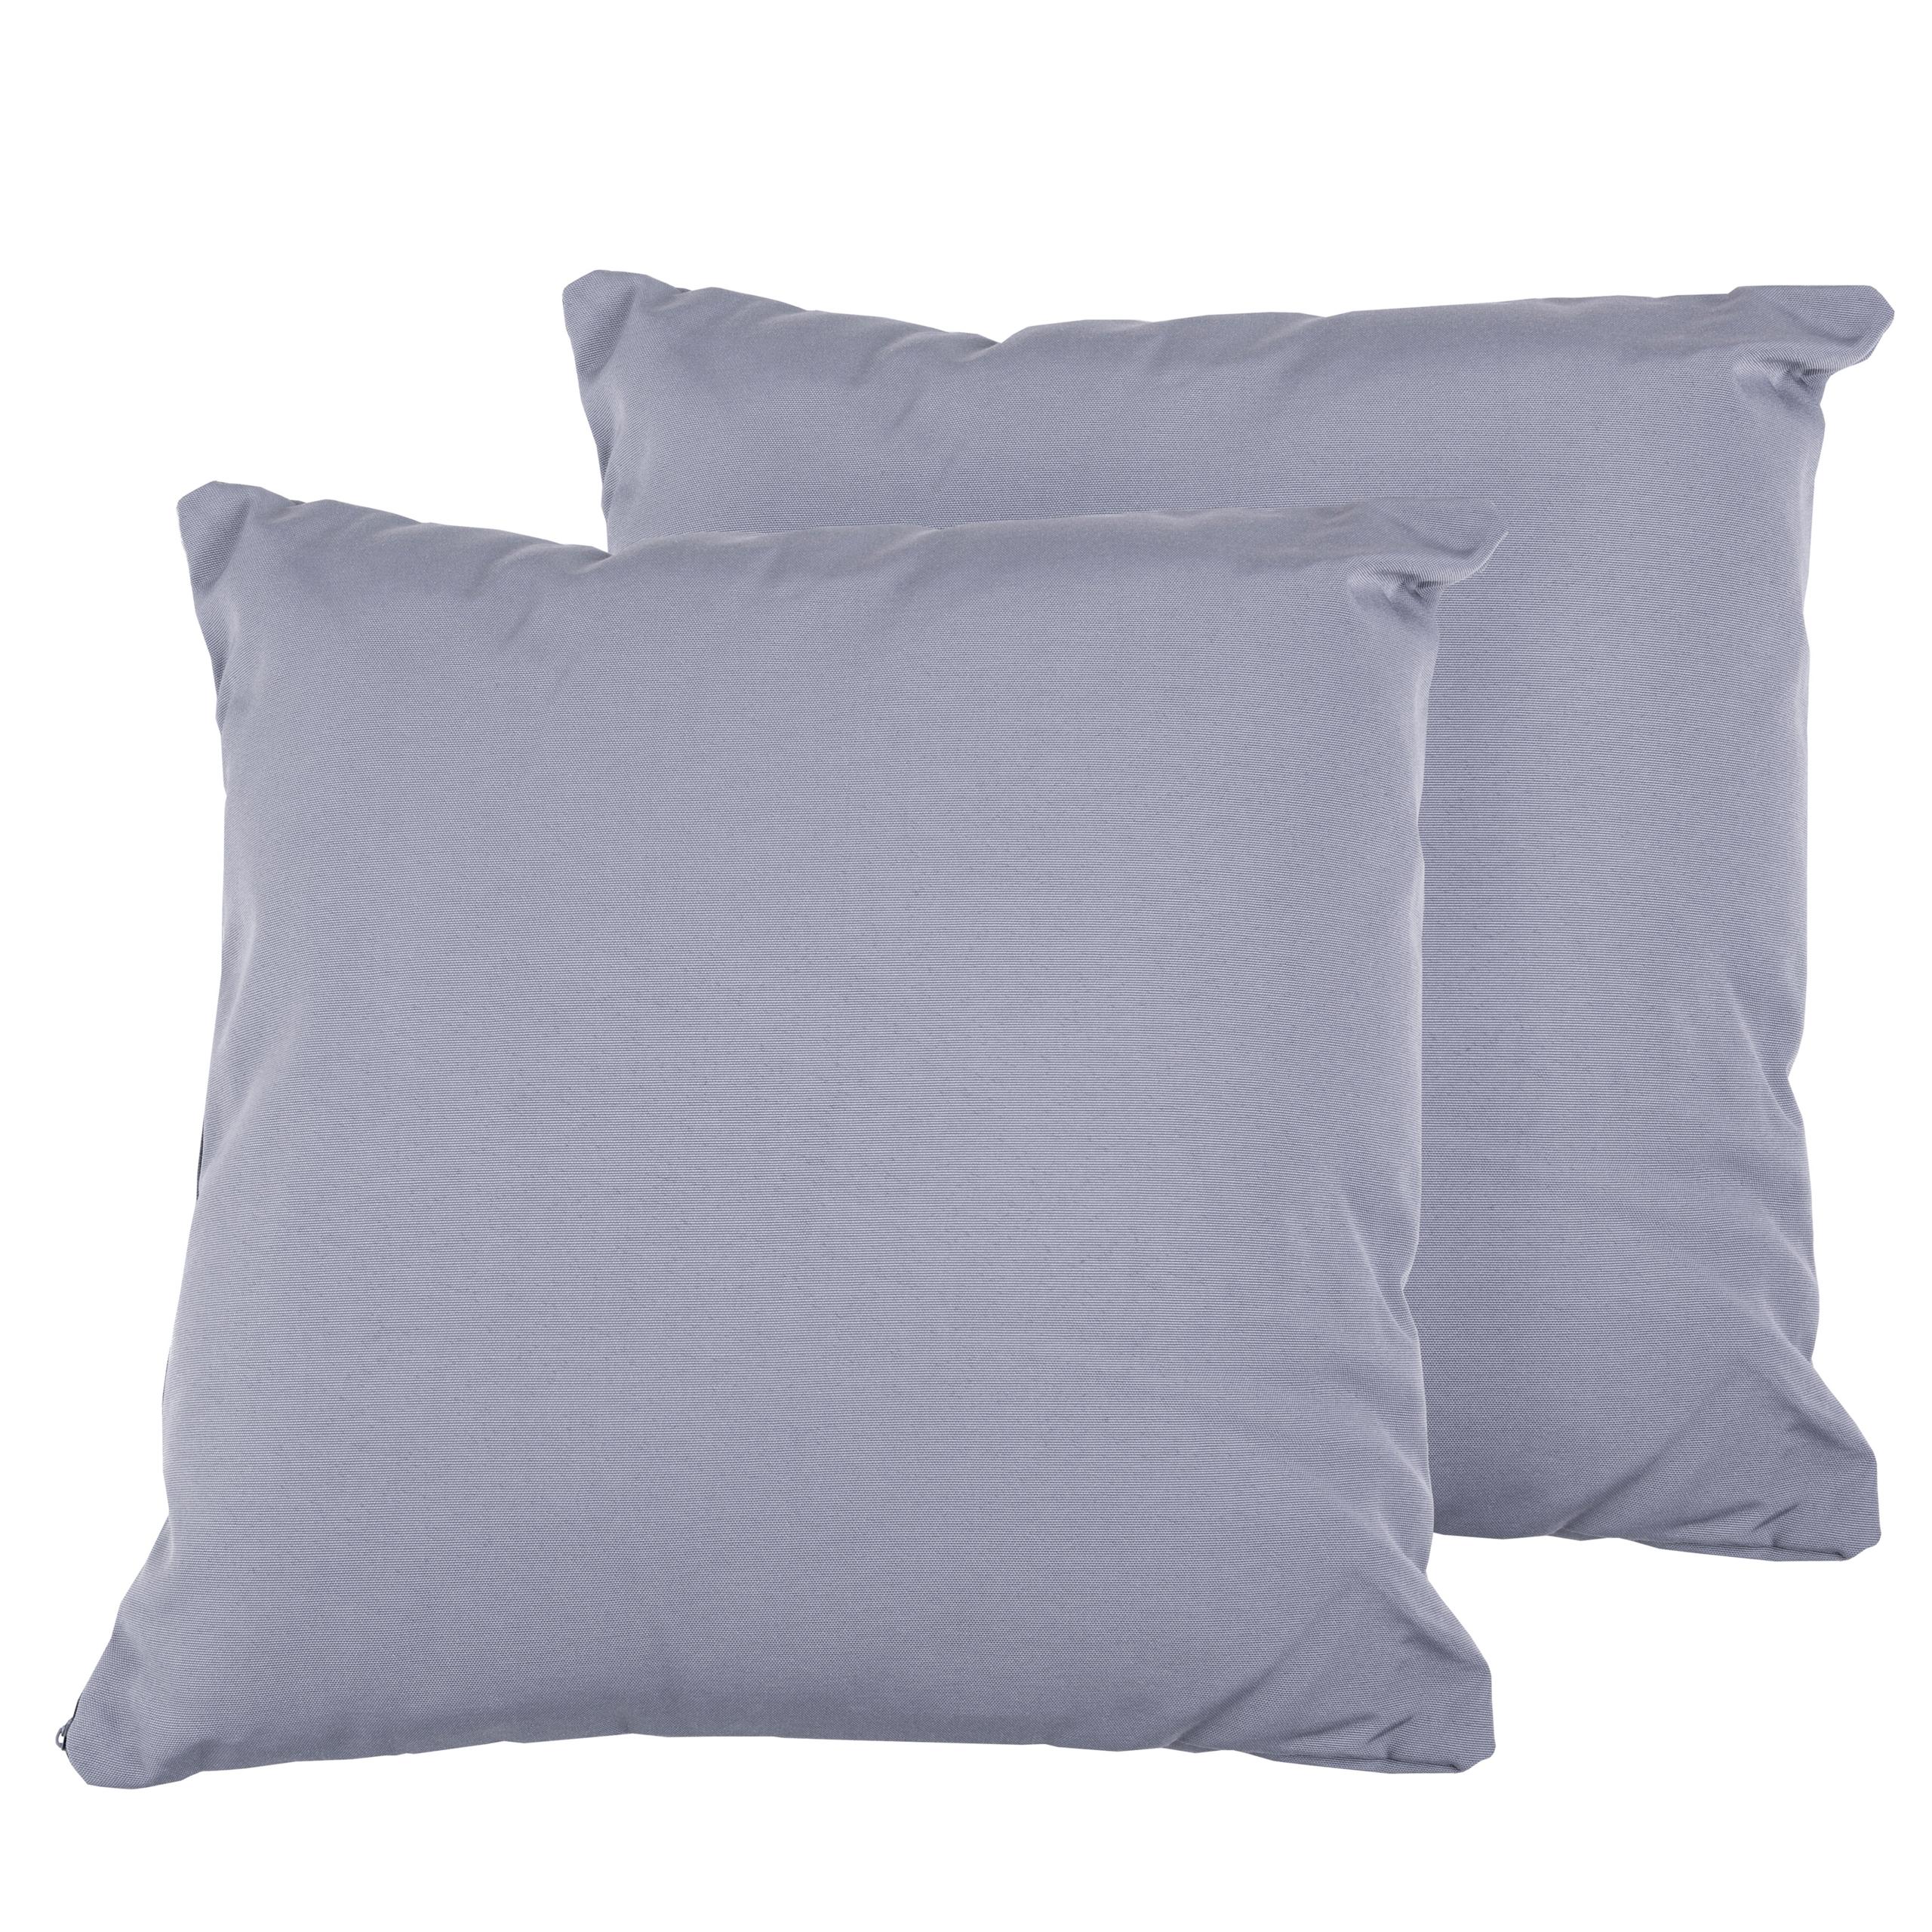 Beliani Set of 2 Outdoor Cushions 40 x 40 cm Grey